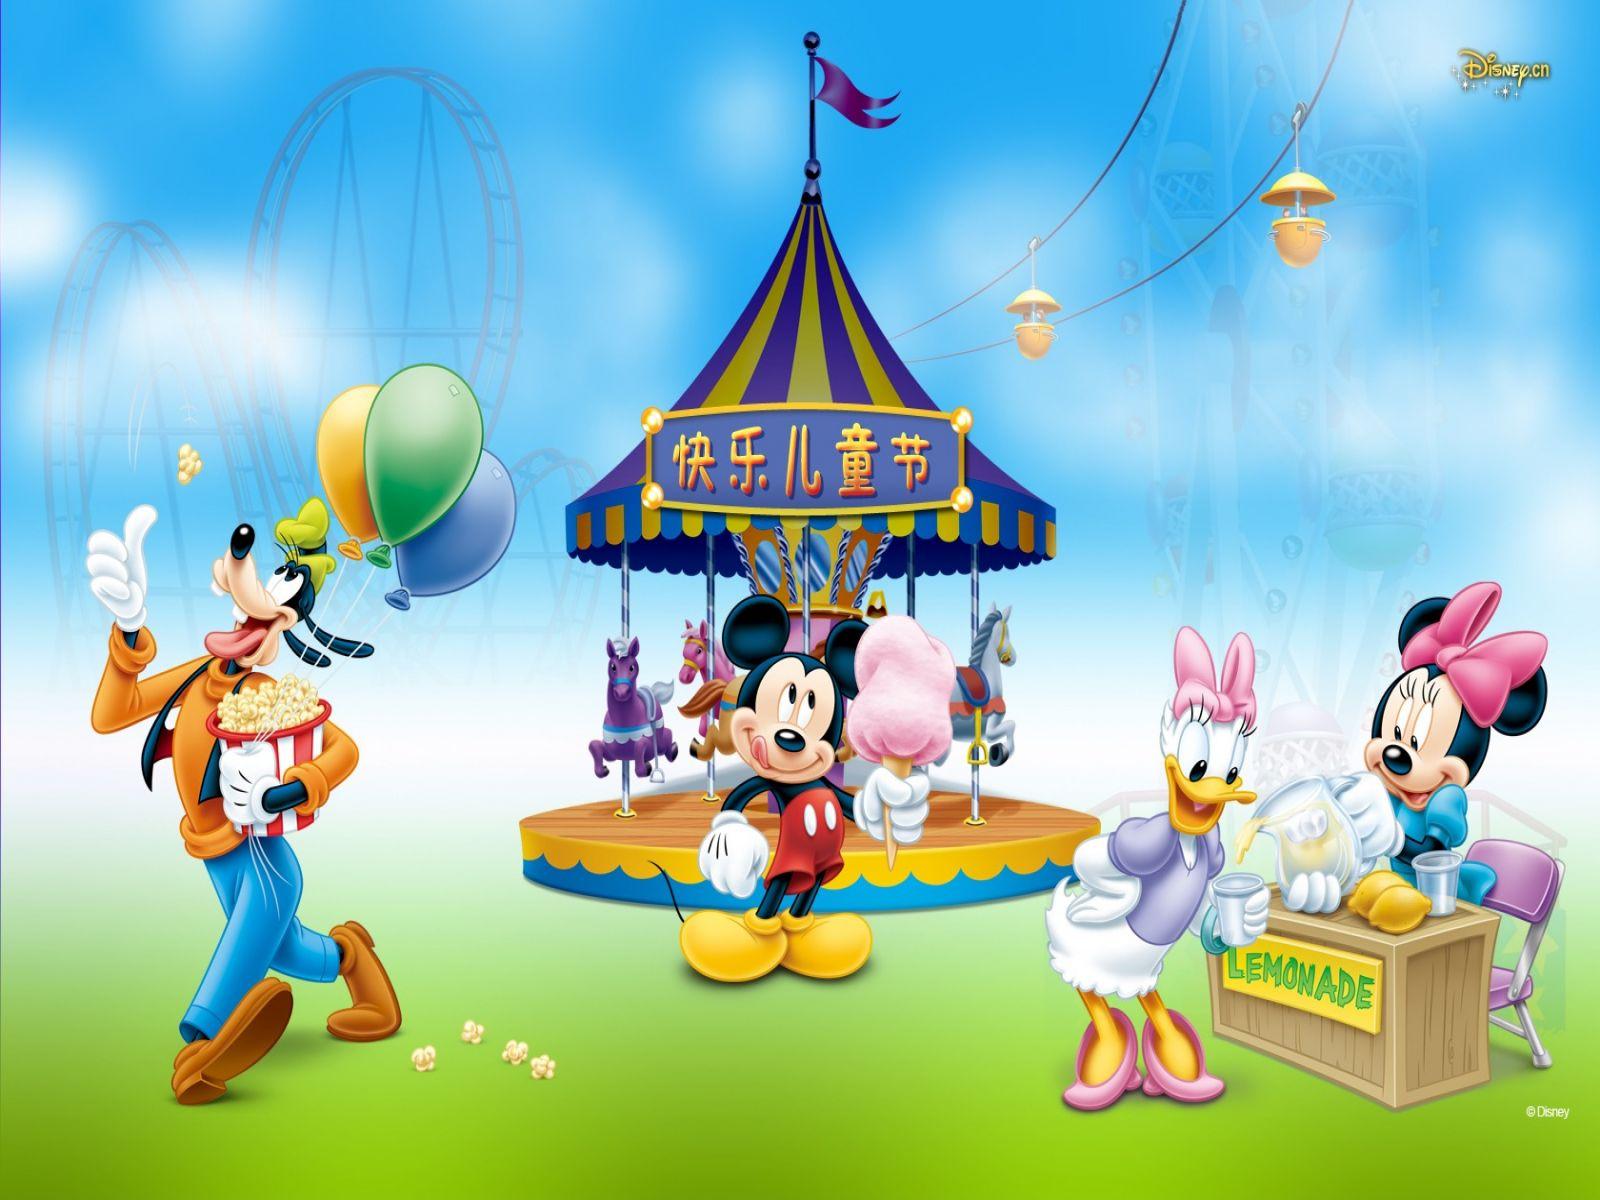 Disney Wallpaper Wallpapers Disney 1600x1200